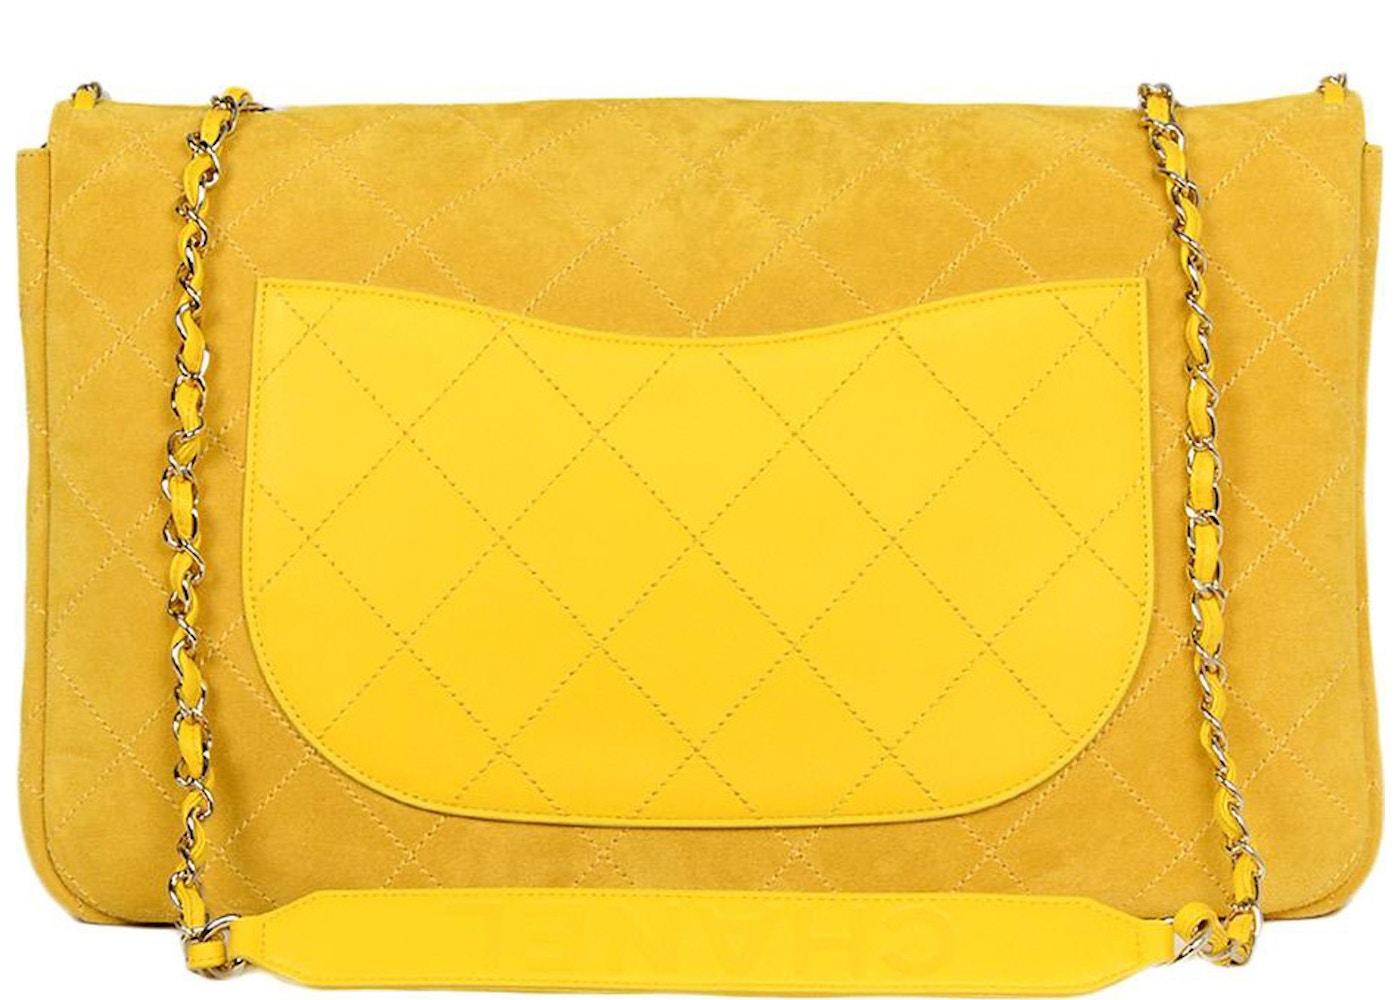 1ed7b1b8095add Chanel x Pharrell Flap Bag XXL Yellow